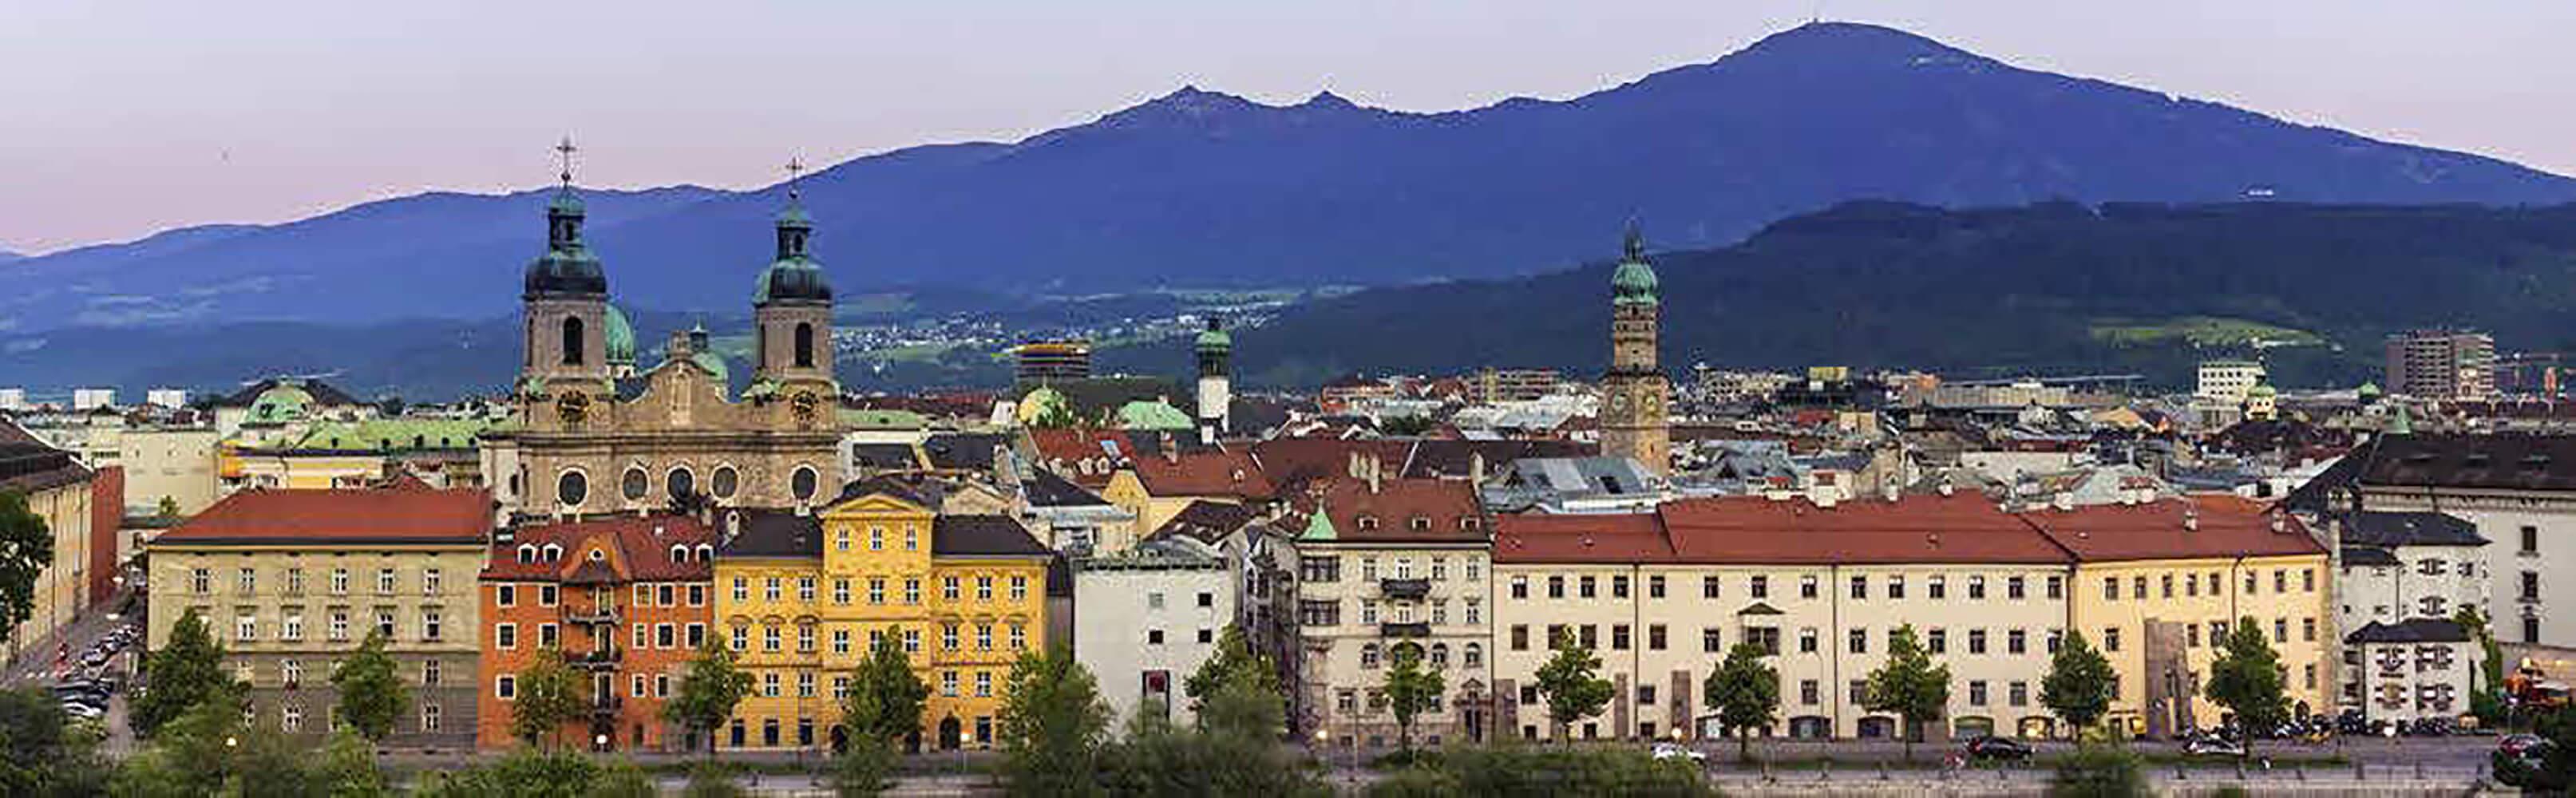 Maria-Theresien-Strasse in Innsbruck 1